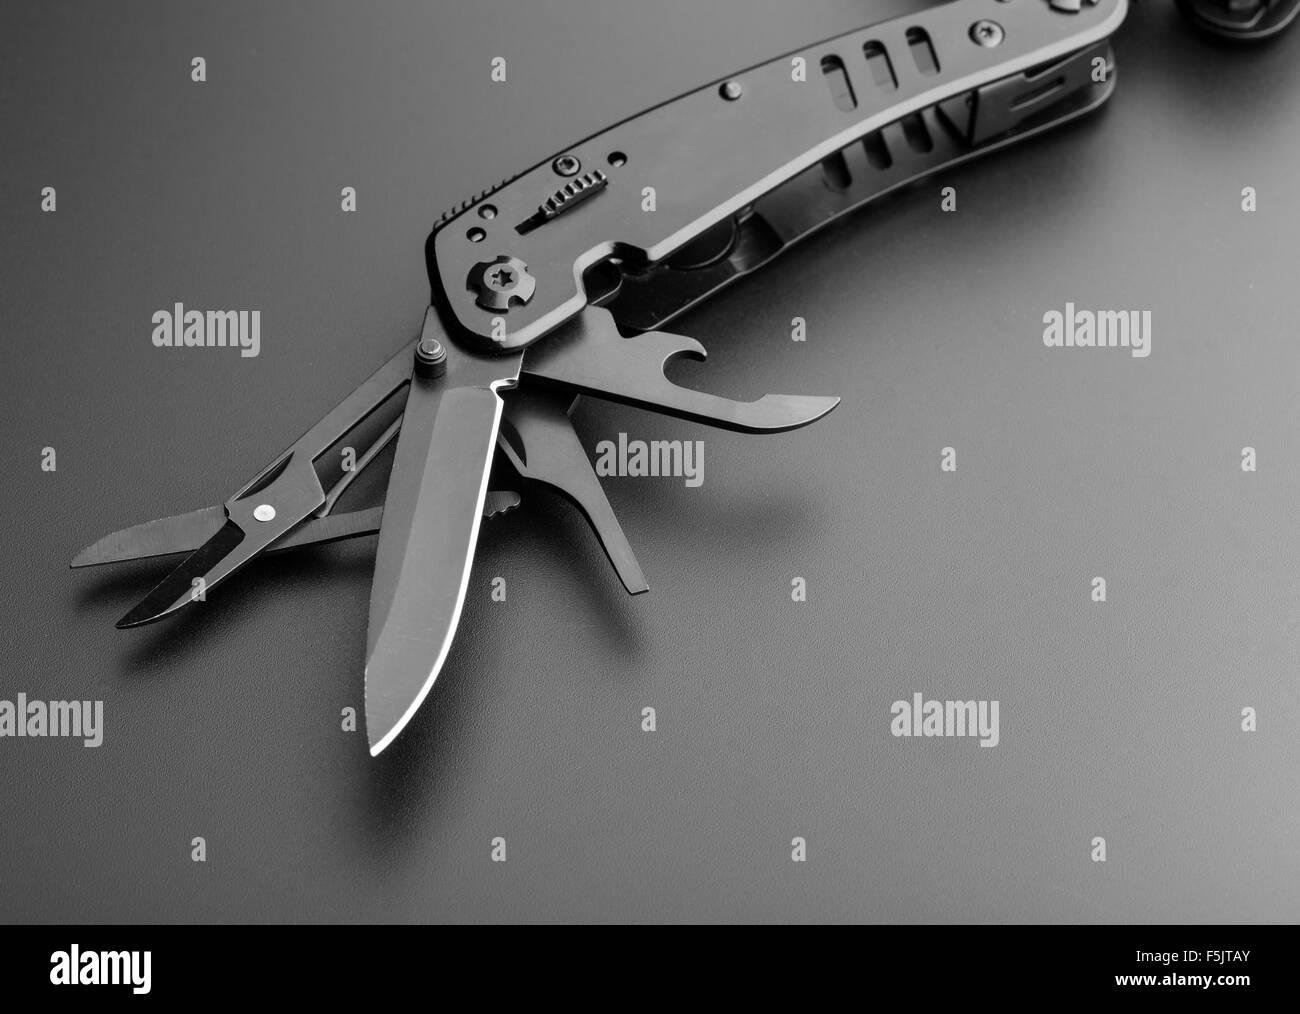 Closeup of black opened multitool knife - Stock Image